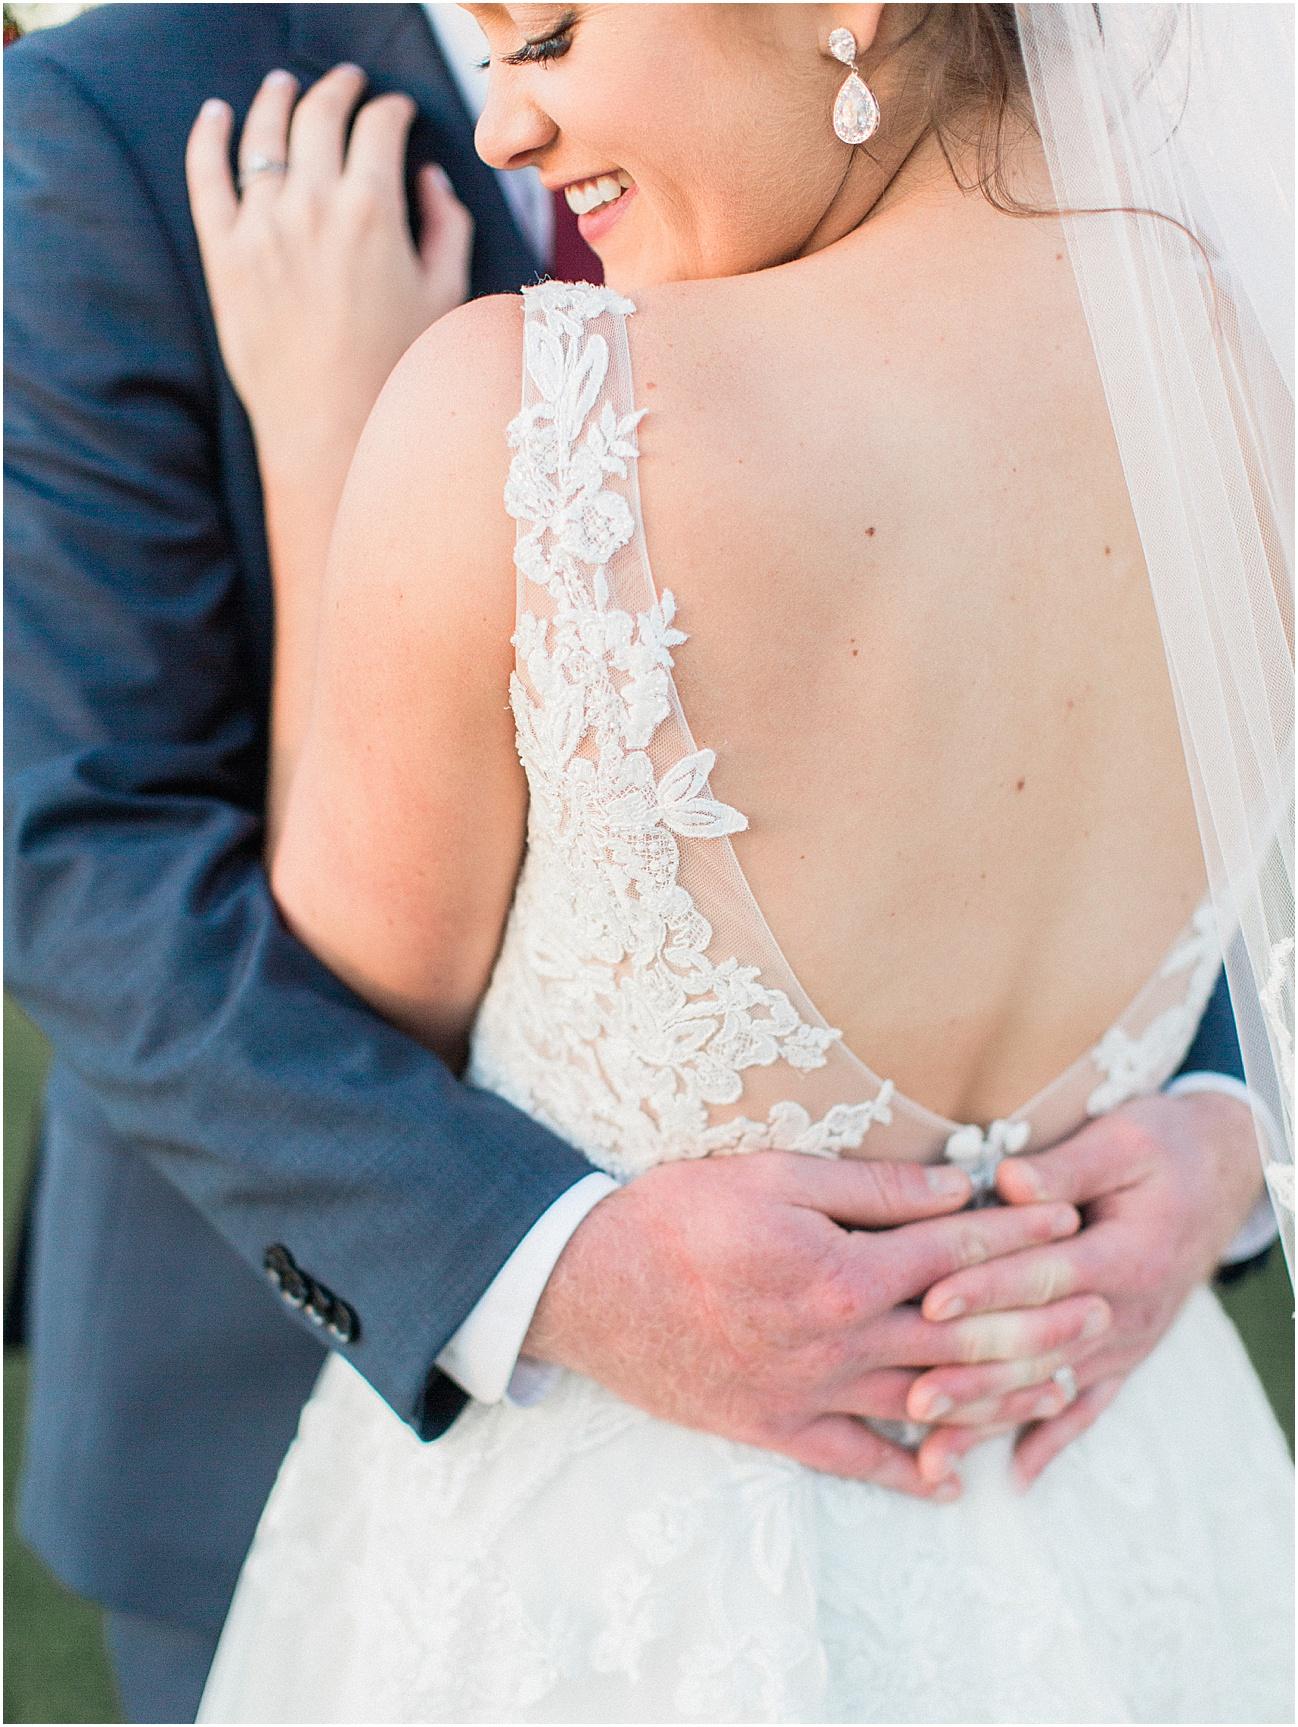 shannon_daniel_dan_atlantic_resort_saint_marys_st_mary_church_fall_newport_catholic_irish_cape_cod_boston_wedding_photographer_meredith_jane_photography_photo_1638.jpg